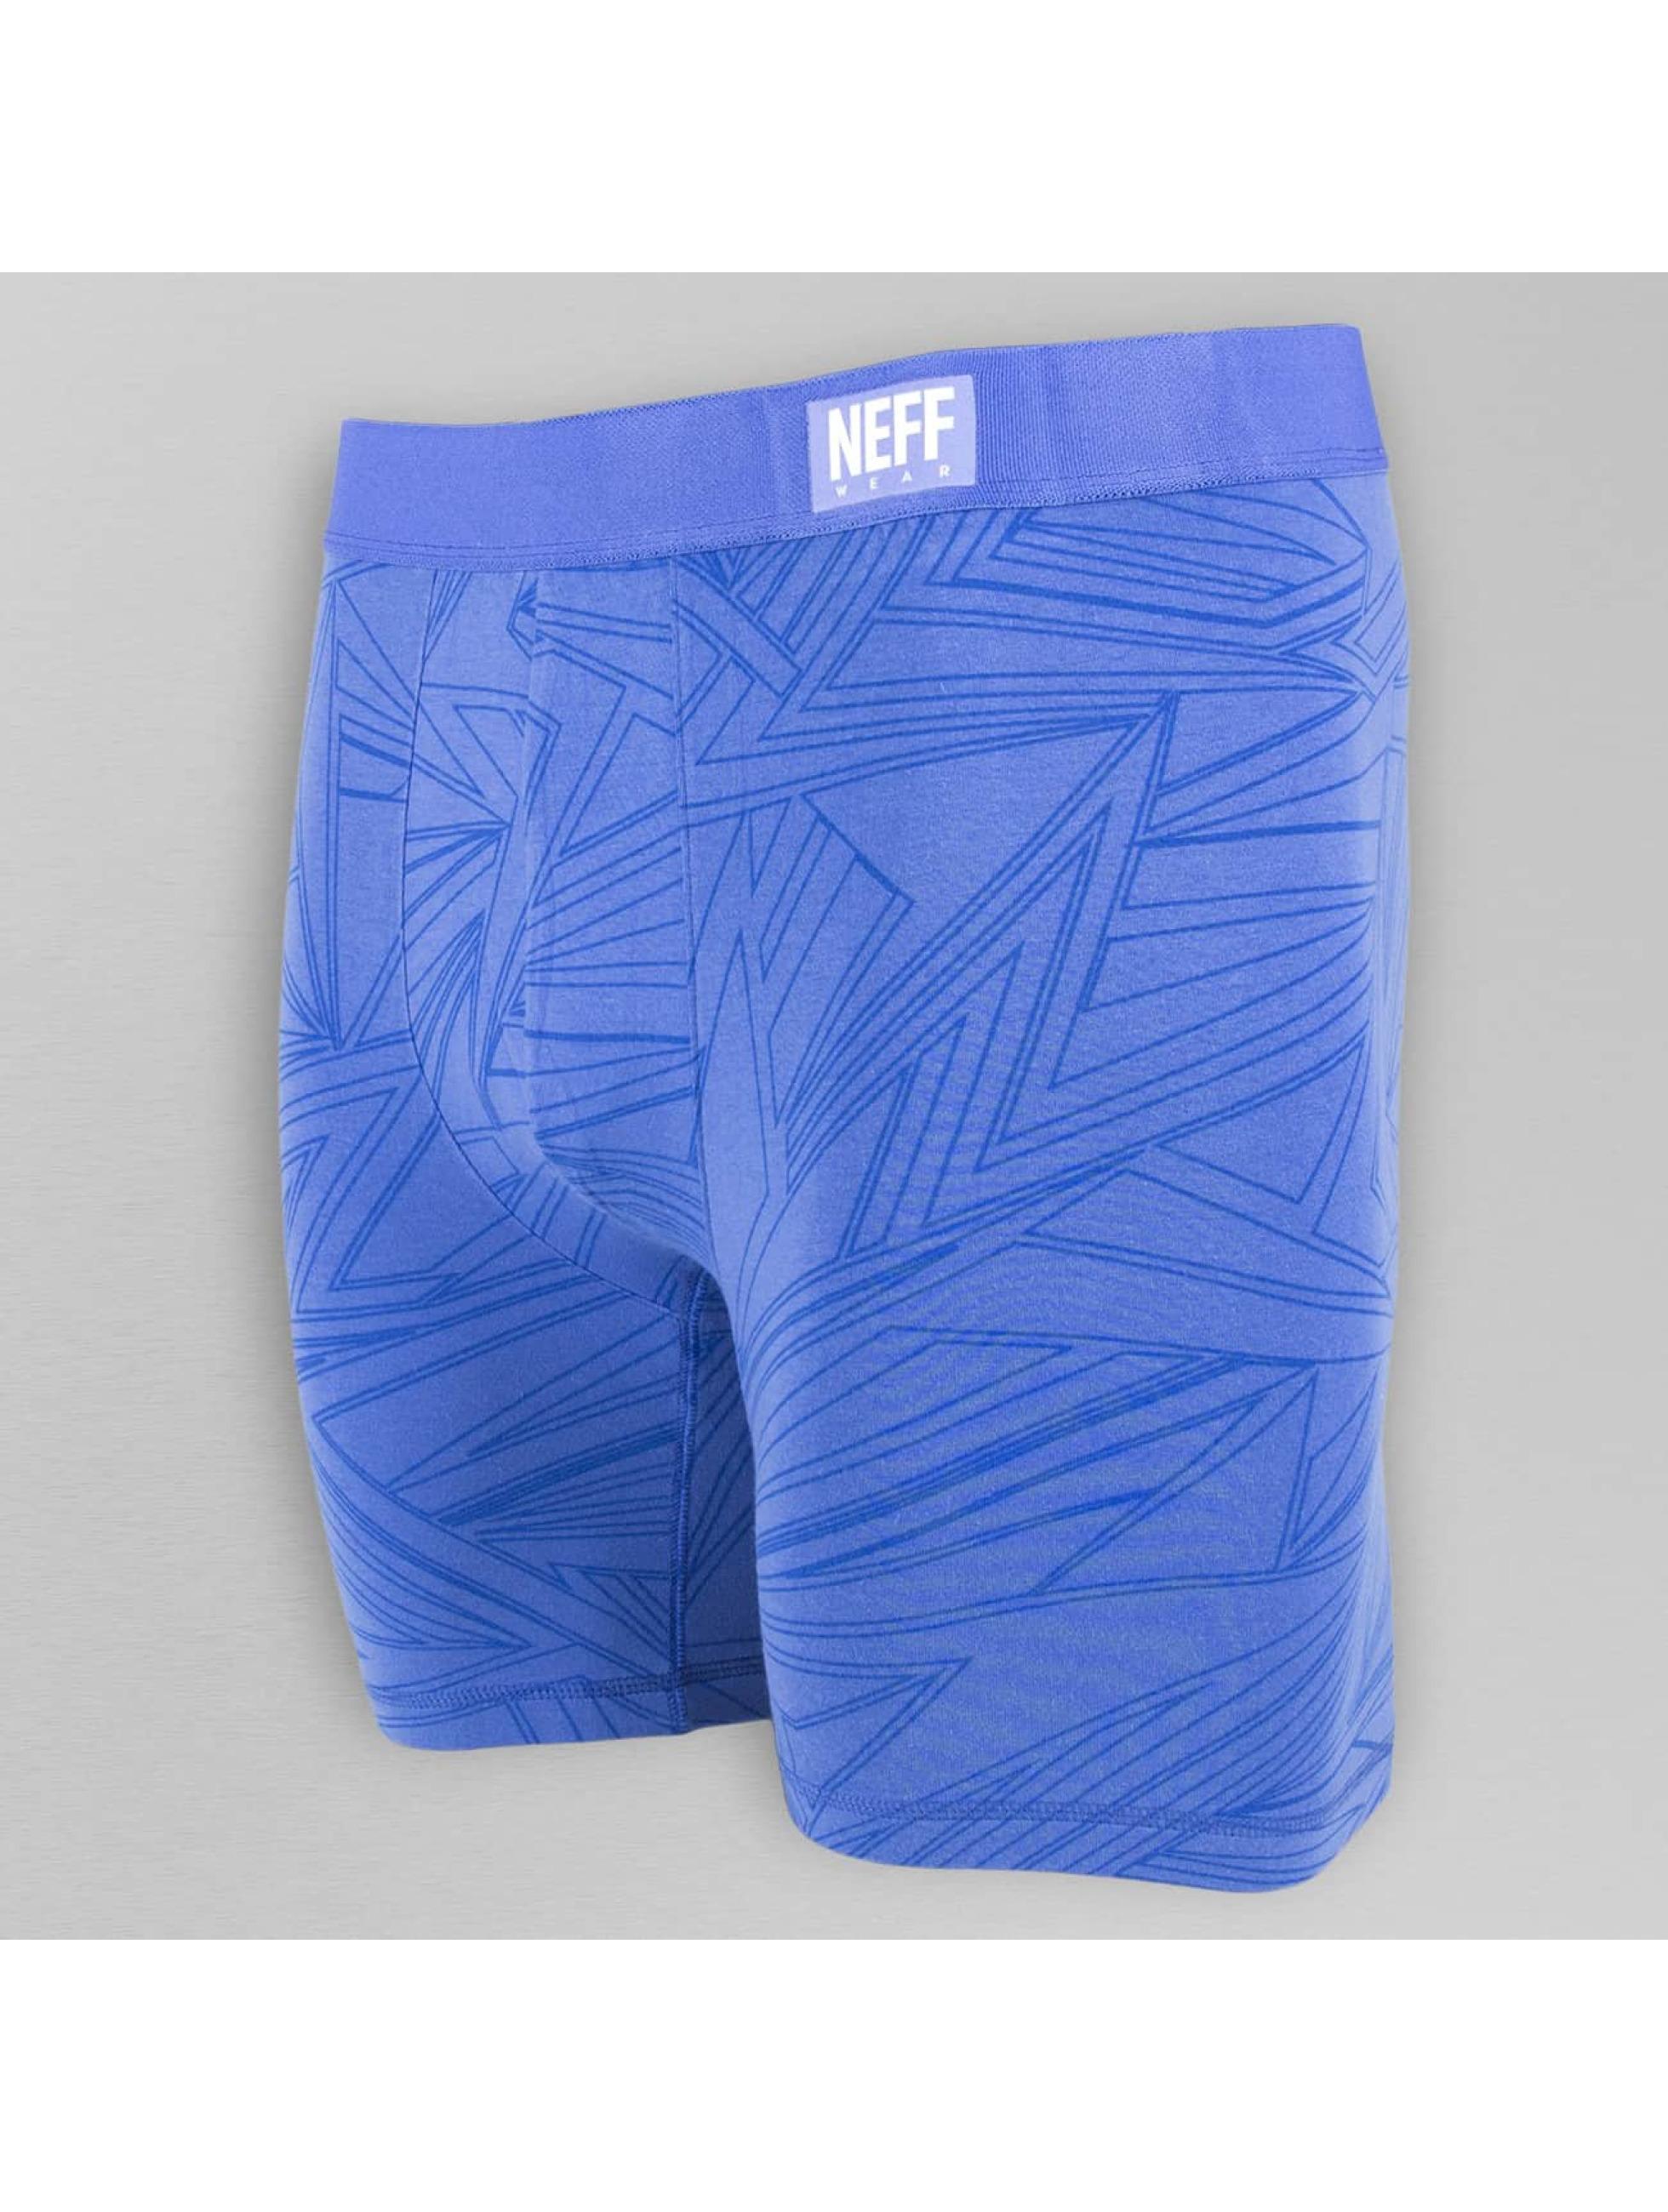 NEFF Boxershorts Daily Underwear Band blau